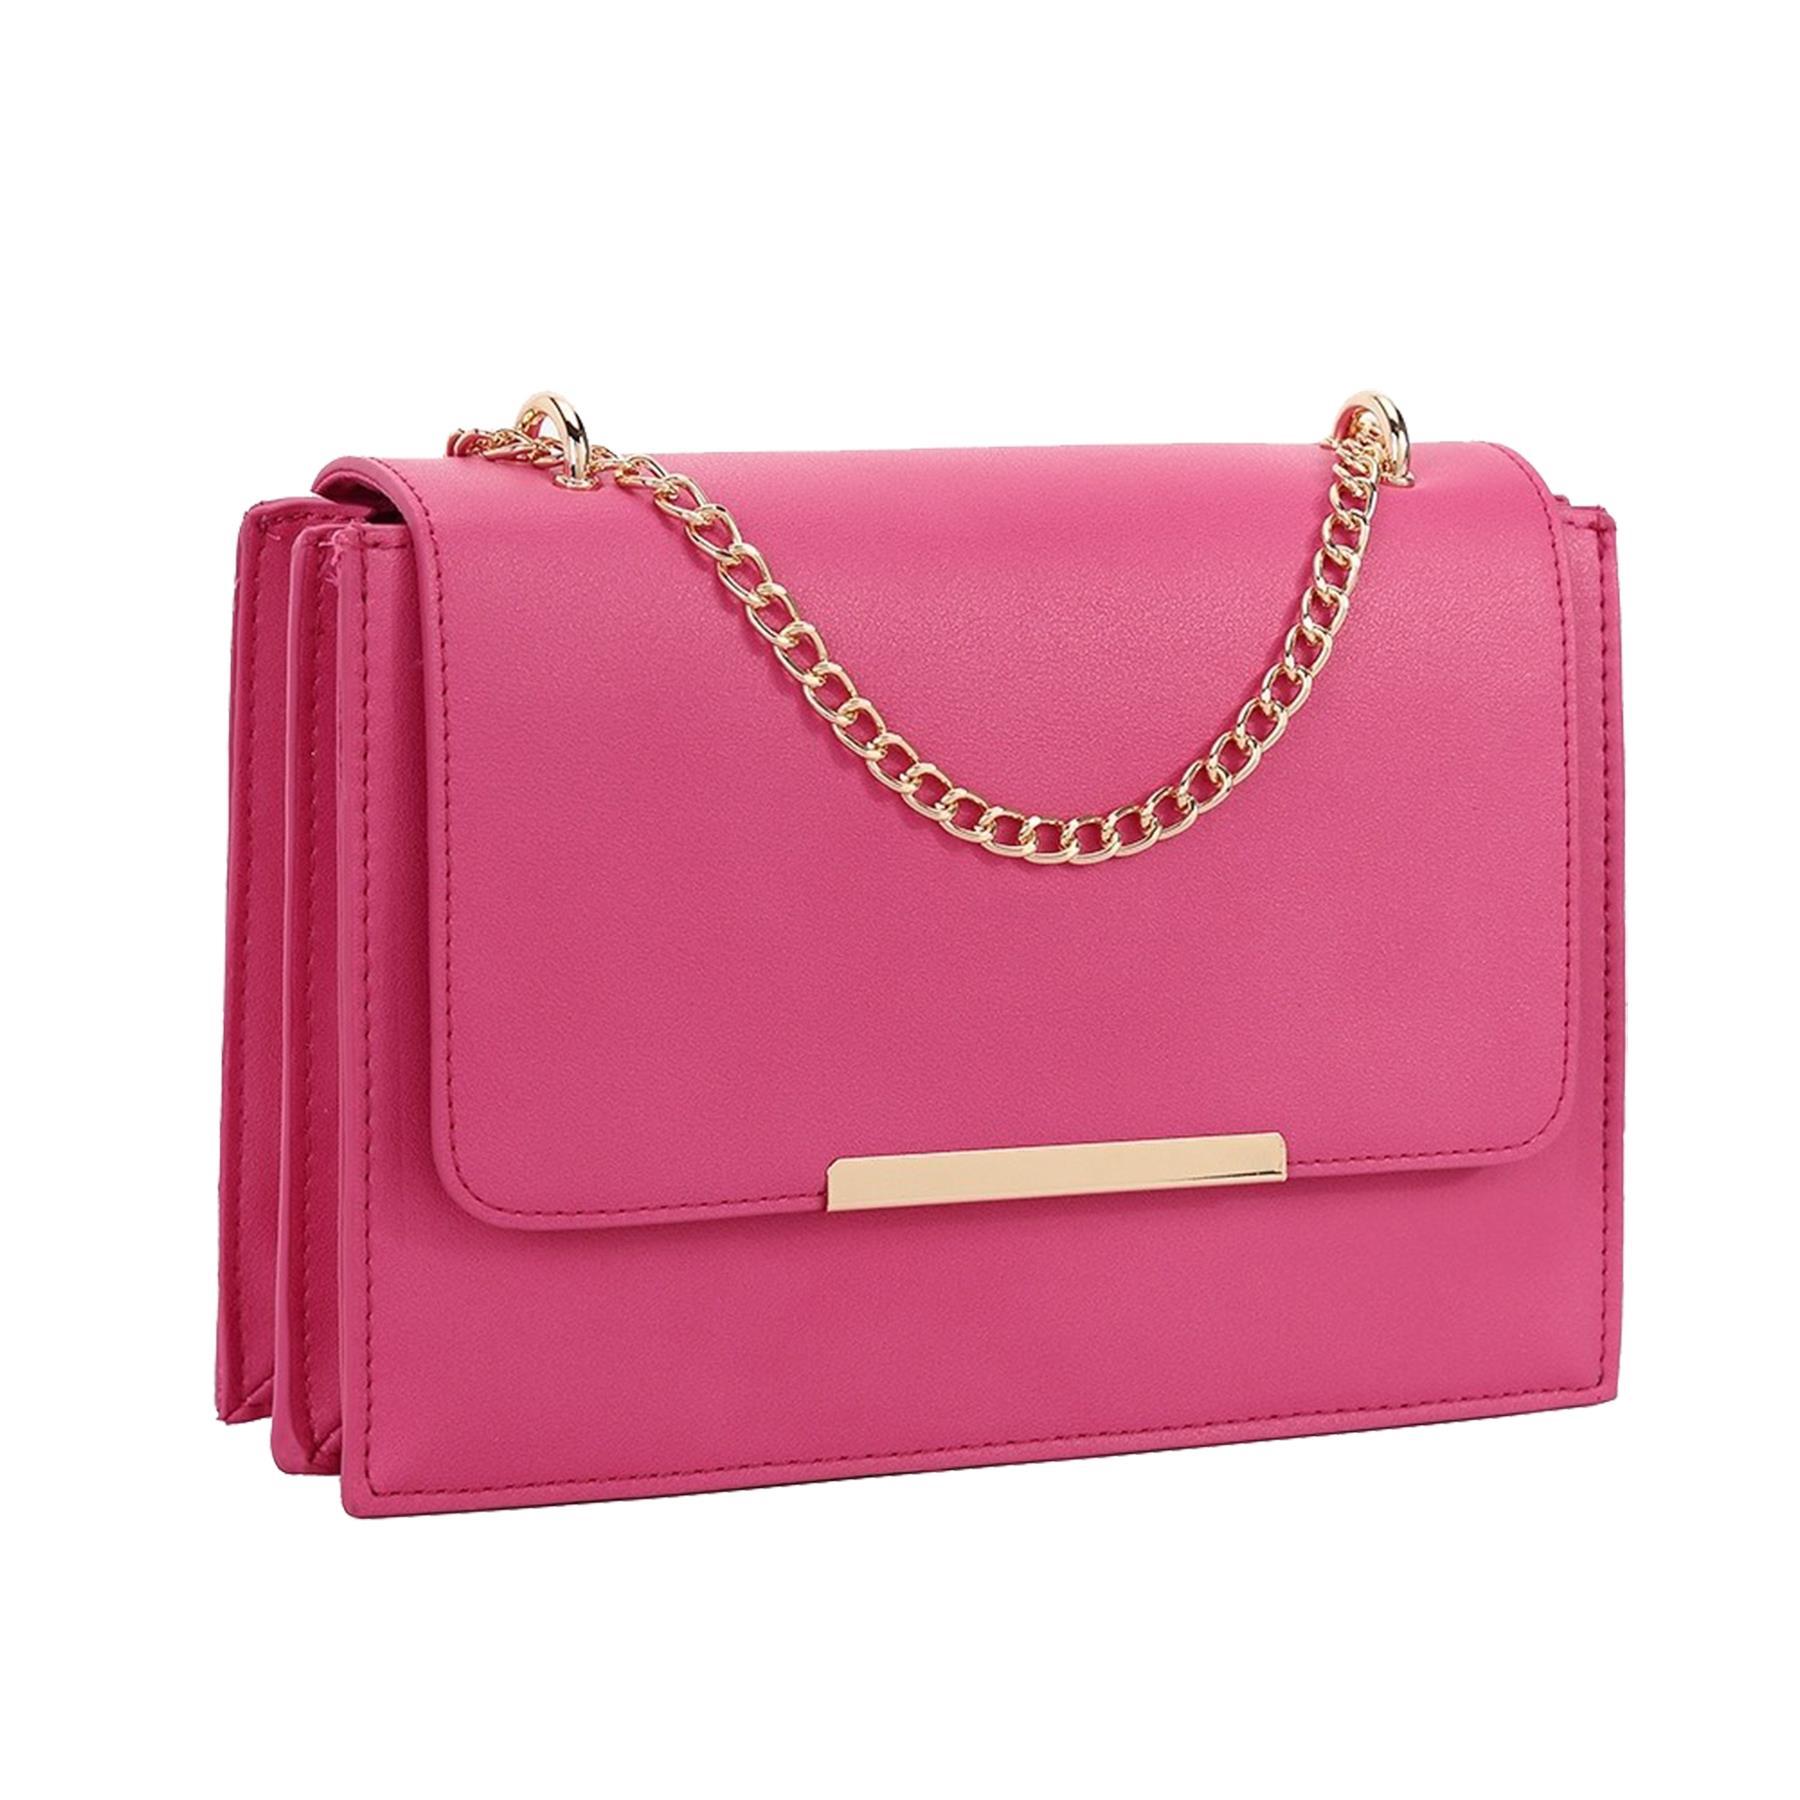 New-Women-s-Faux-Leather-Elegant-Stylish-Fashion-Shoulder-Clutch-Bag thumbnail 15